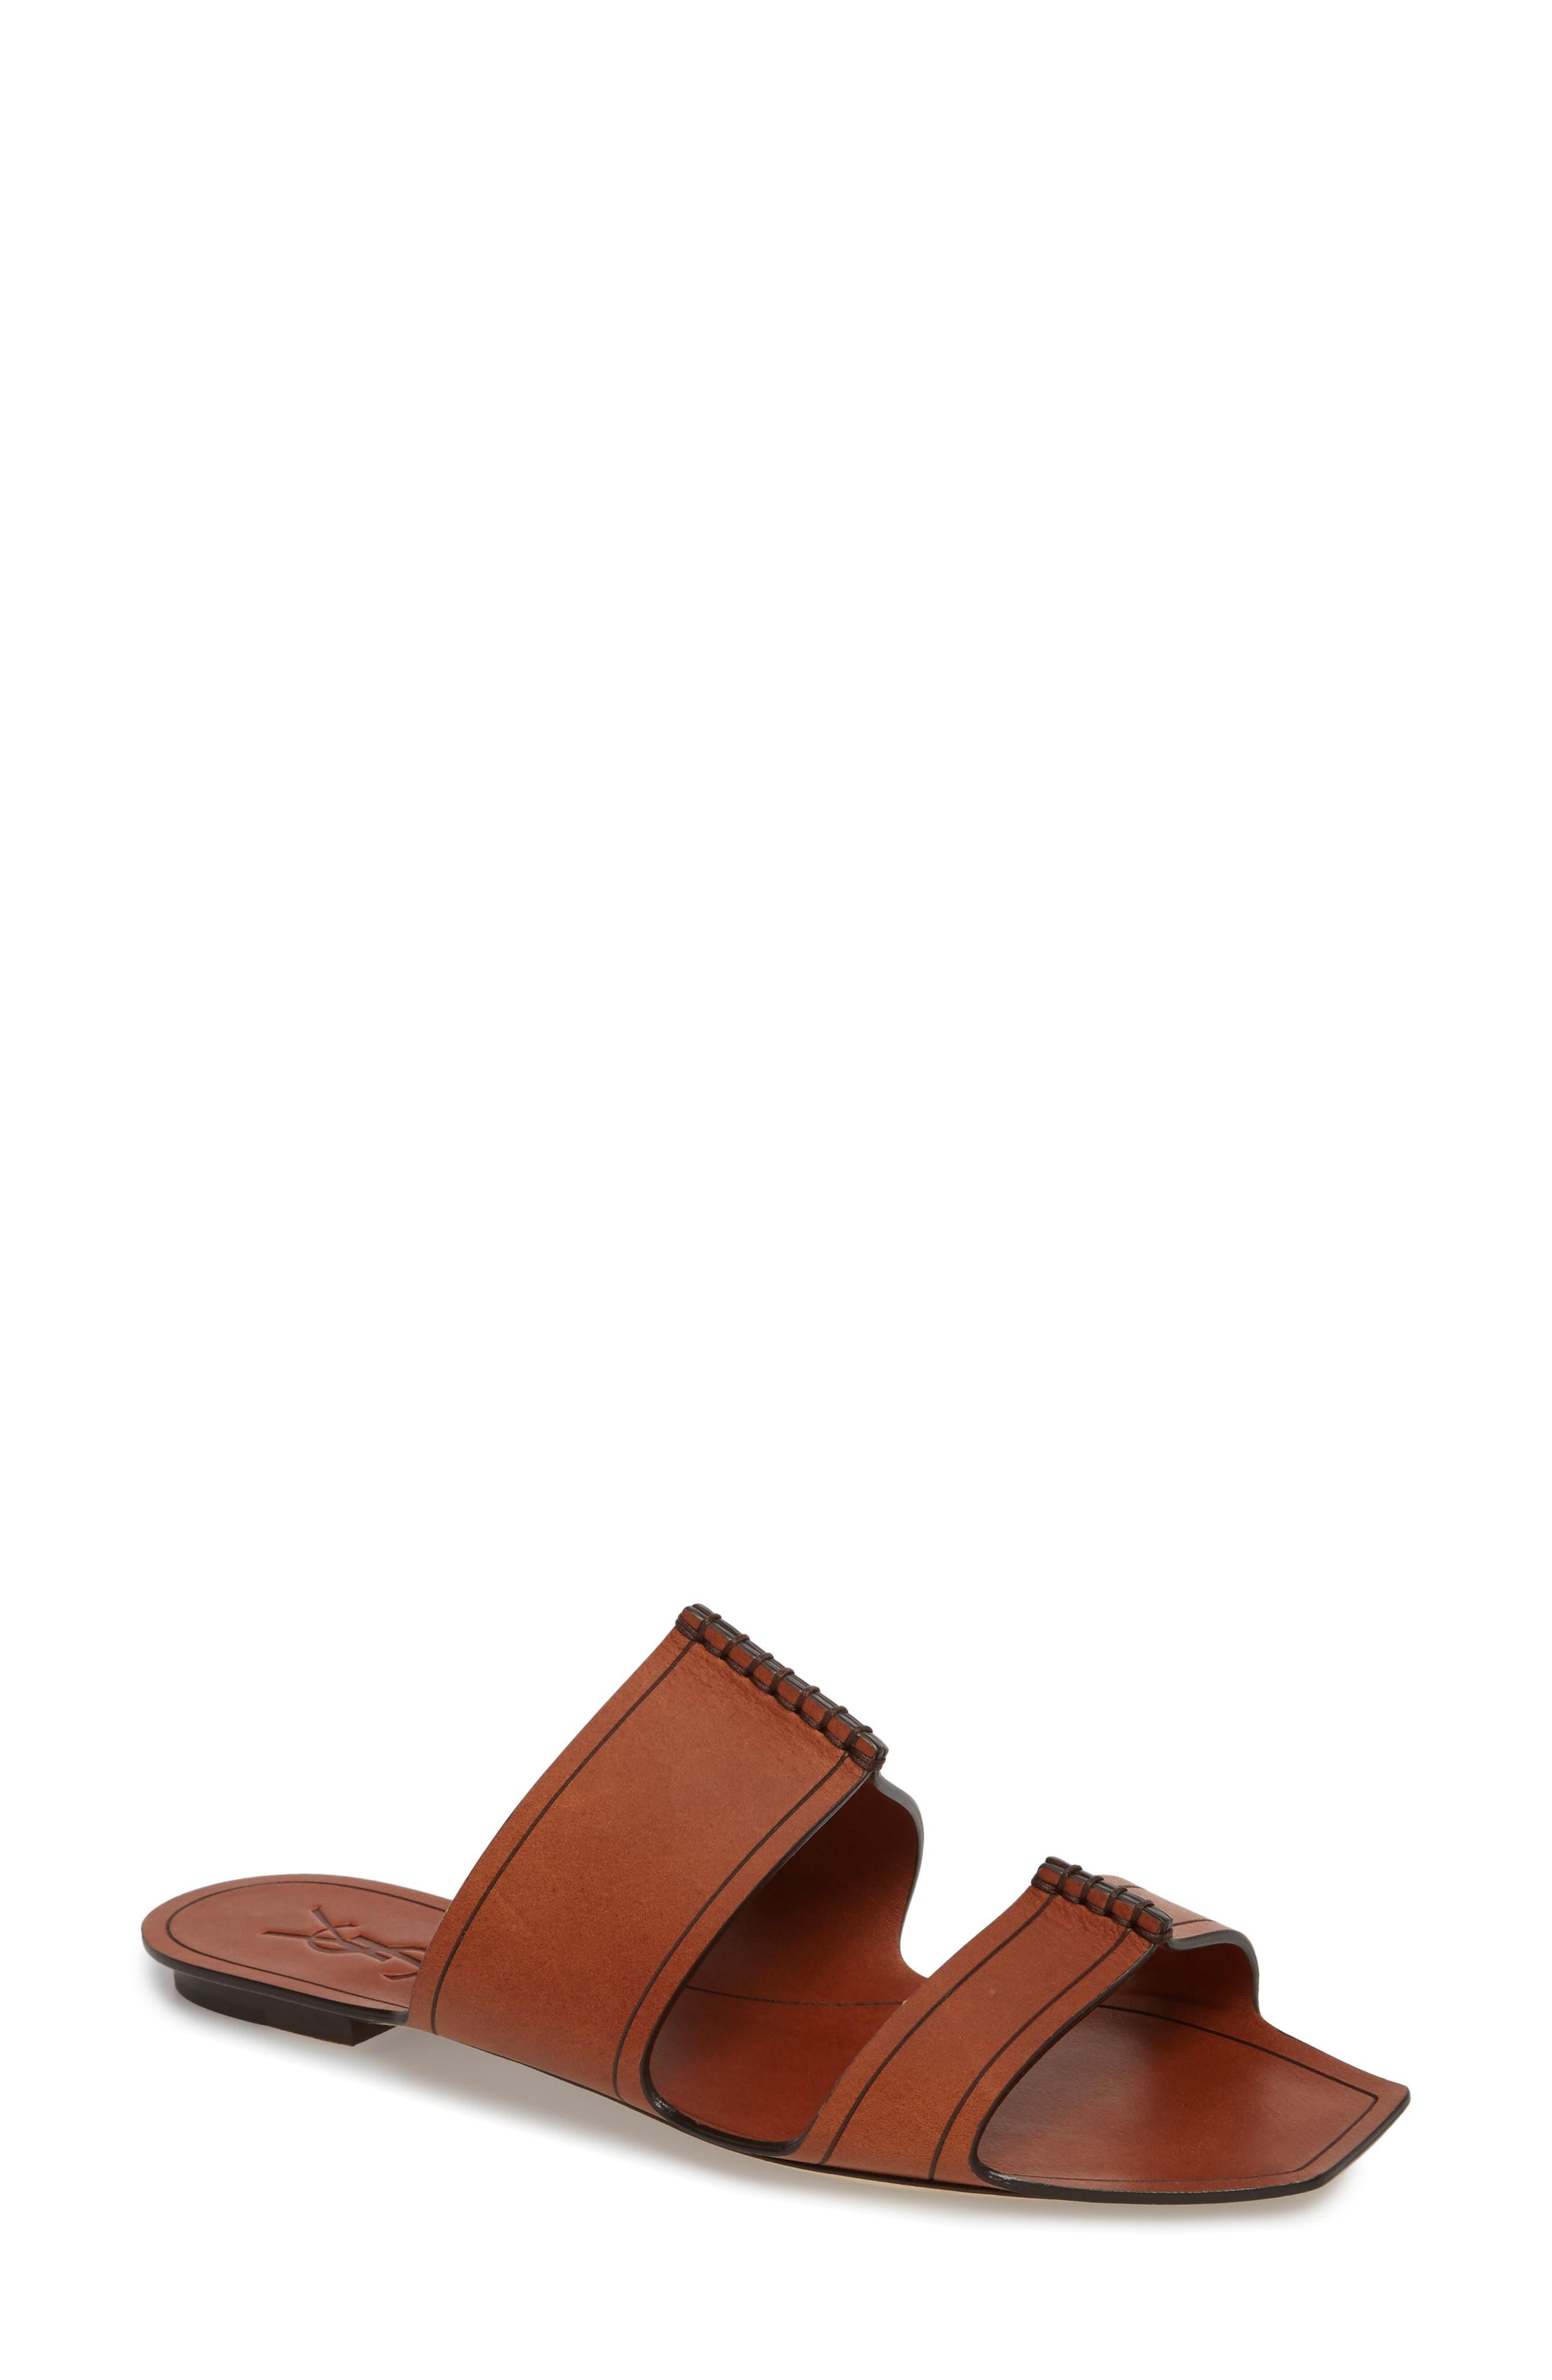 Double Band Slide Sandal,                         Main,                         color, Caramel